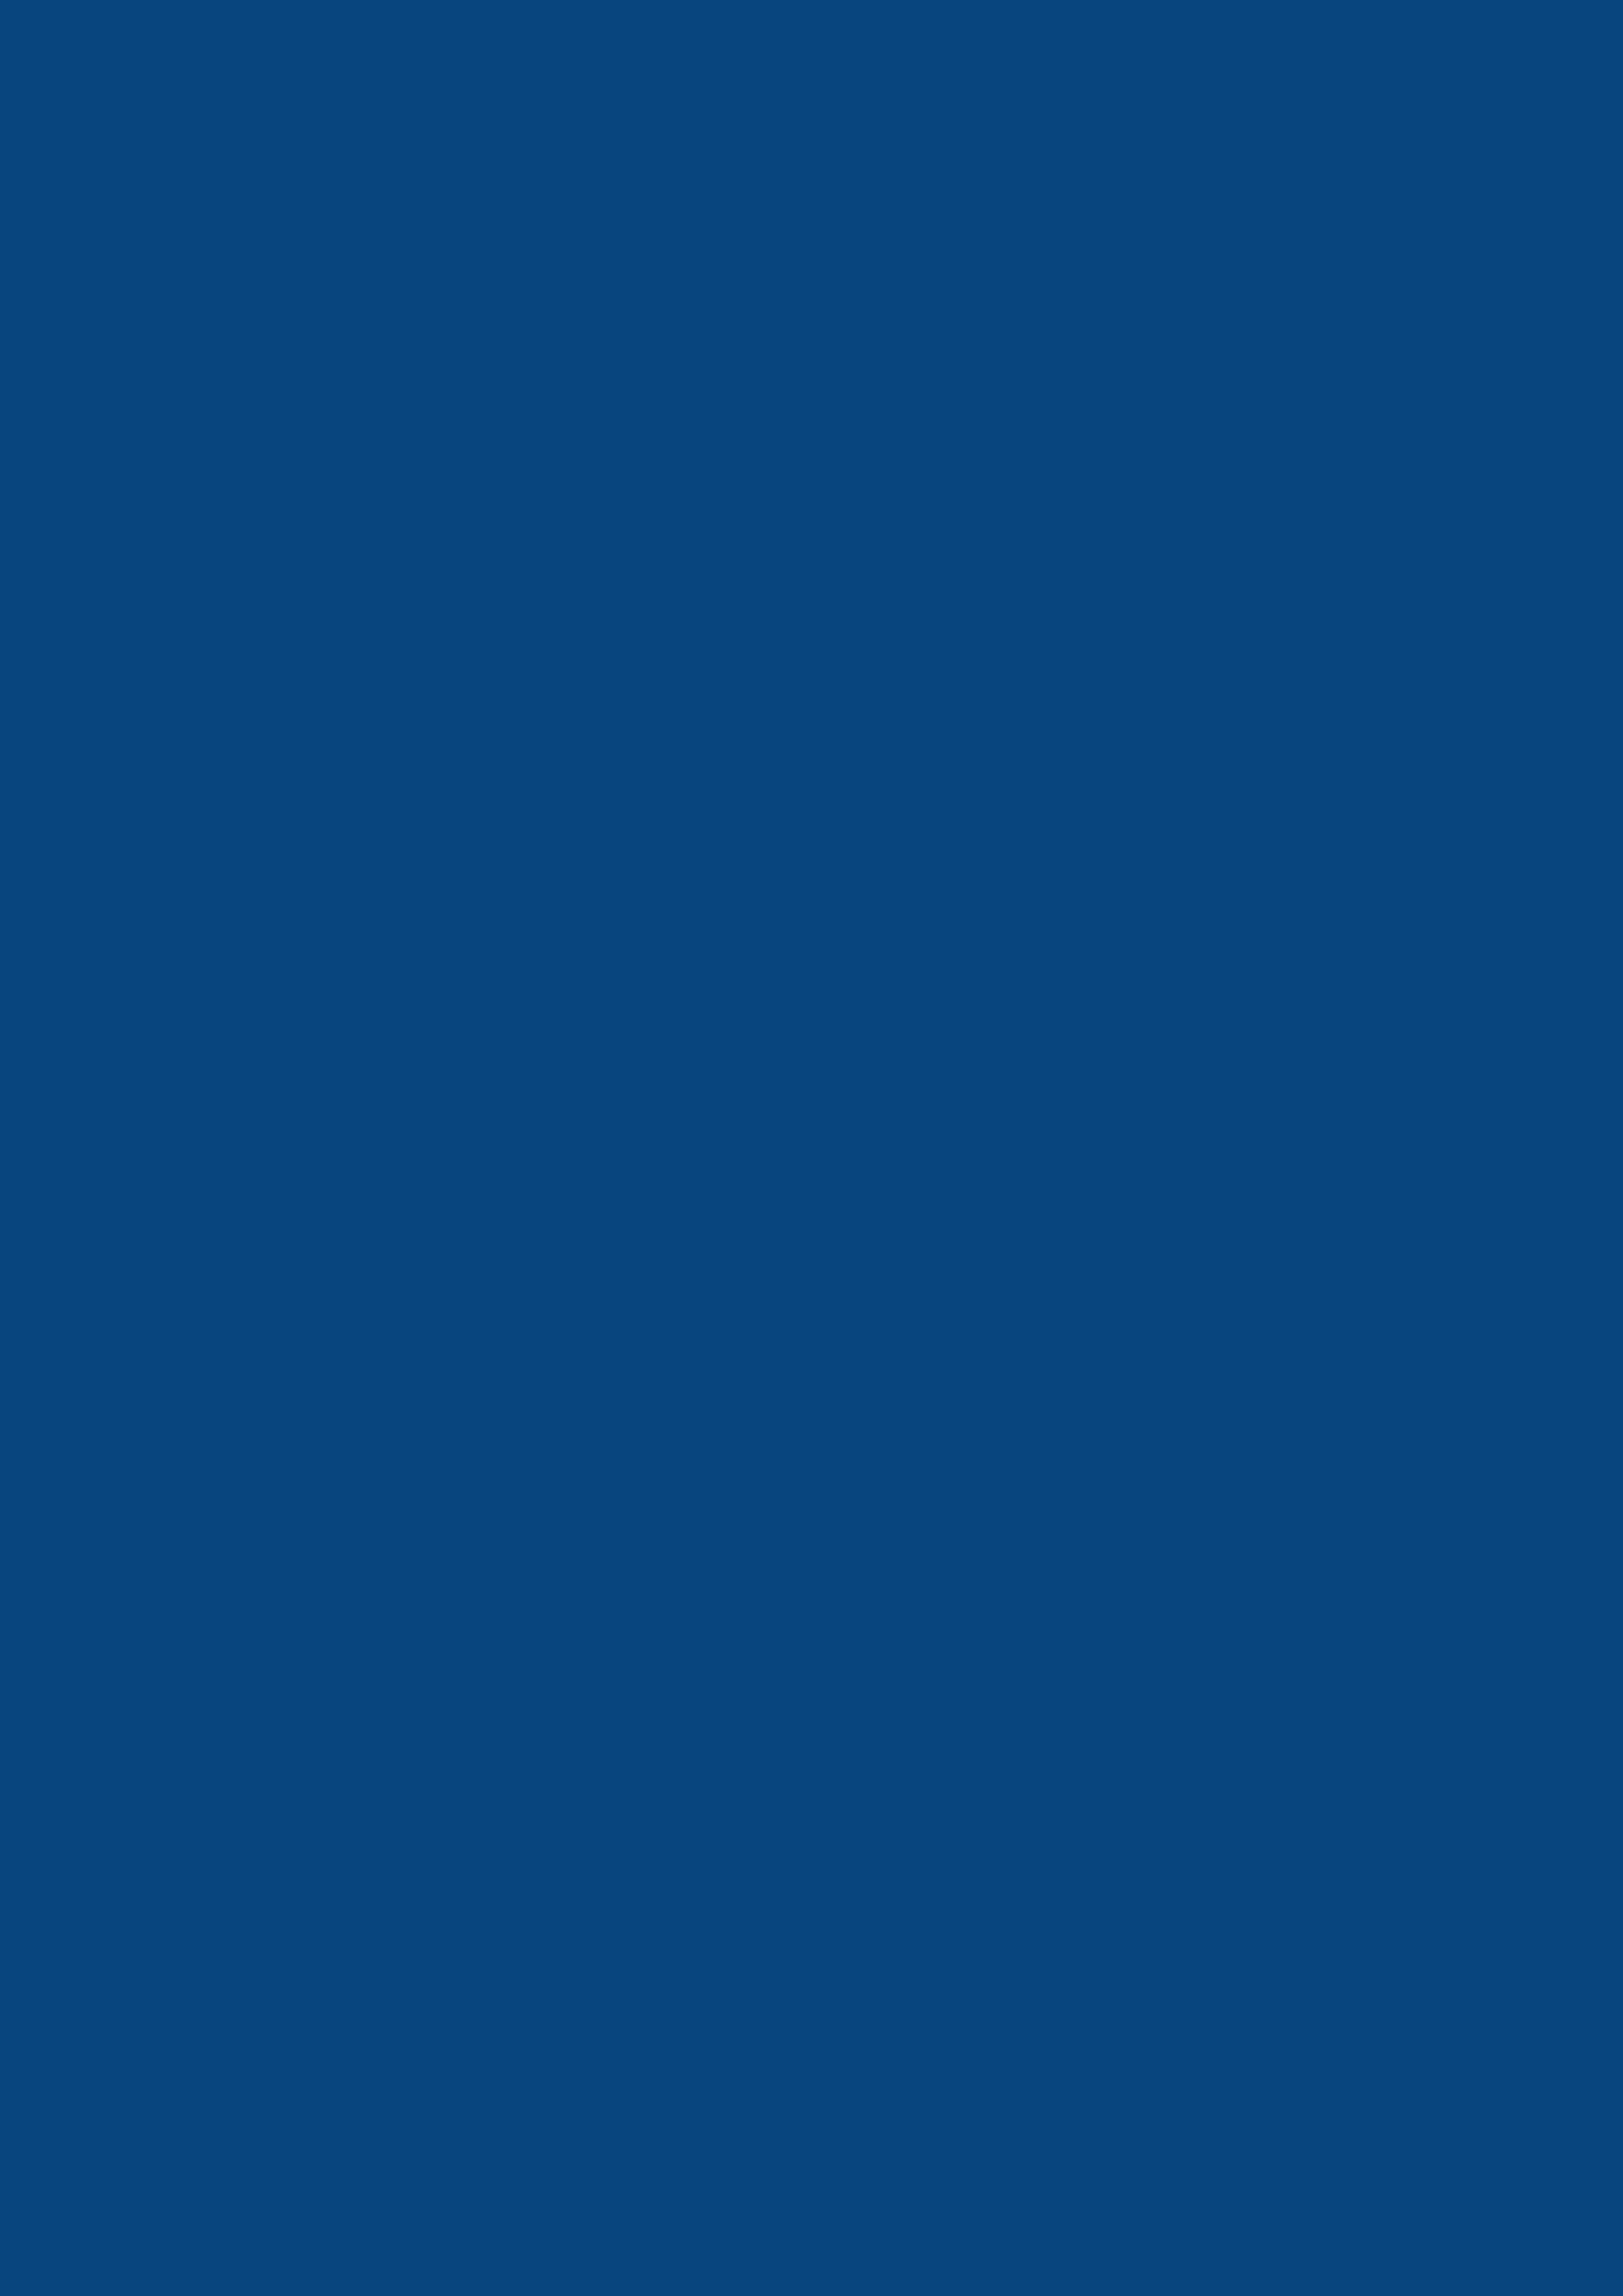 2480x3508 Dark Cerulean Solid Color Background